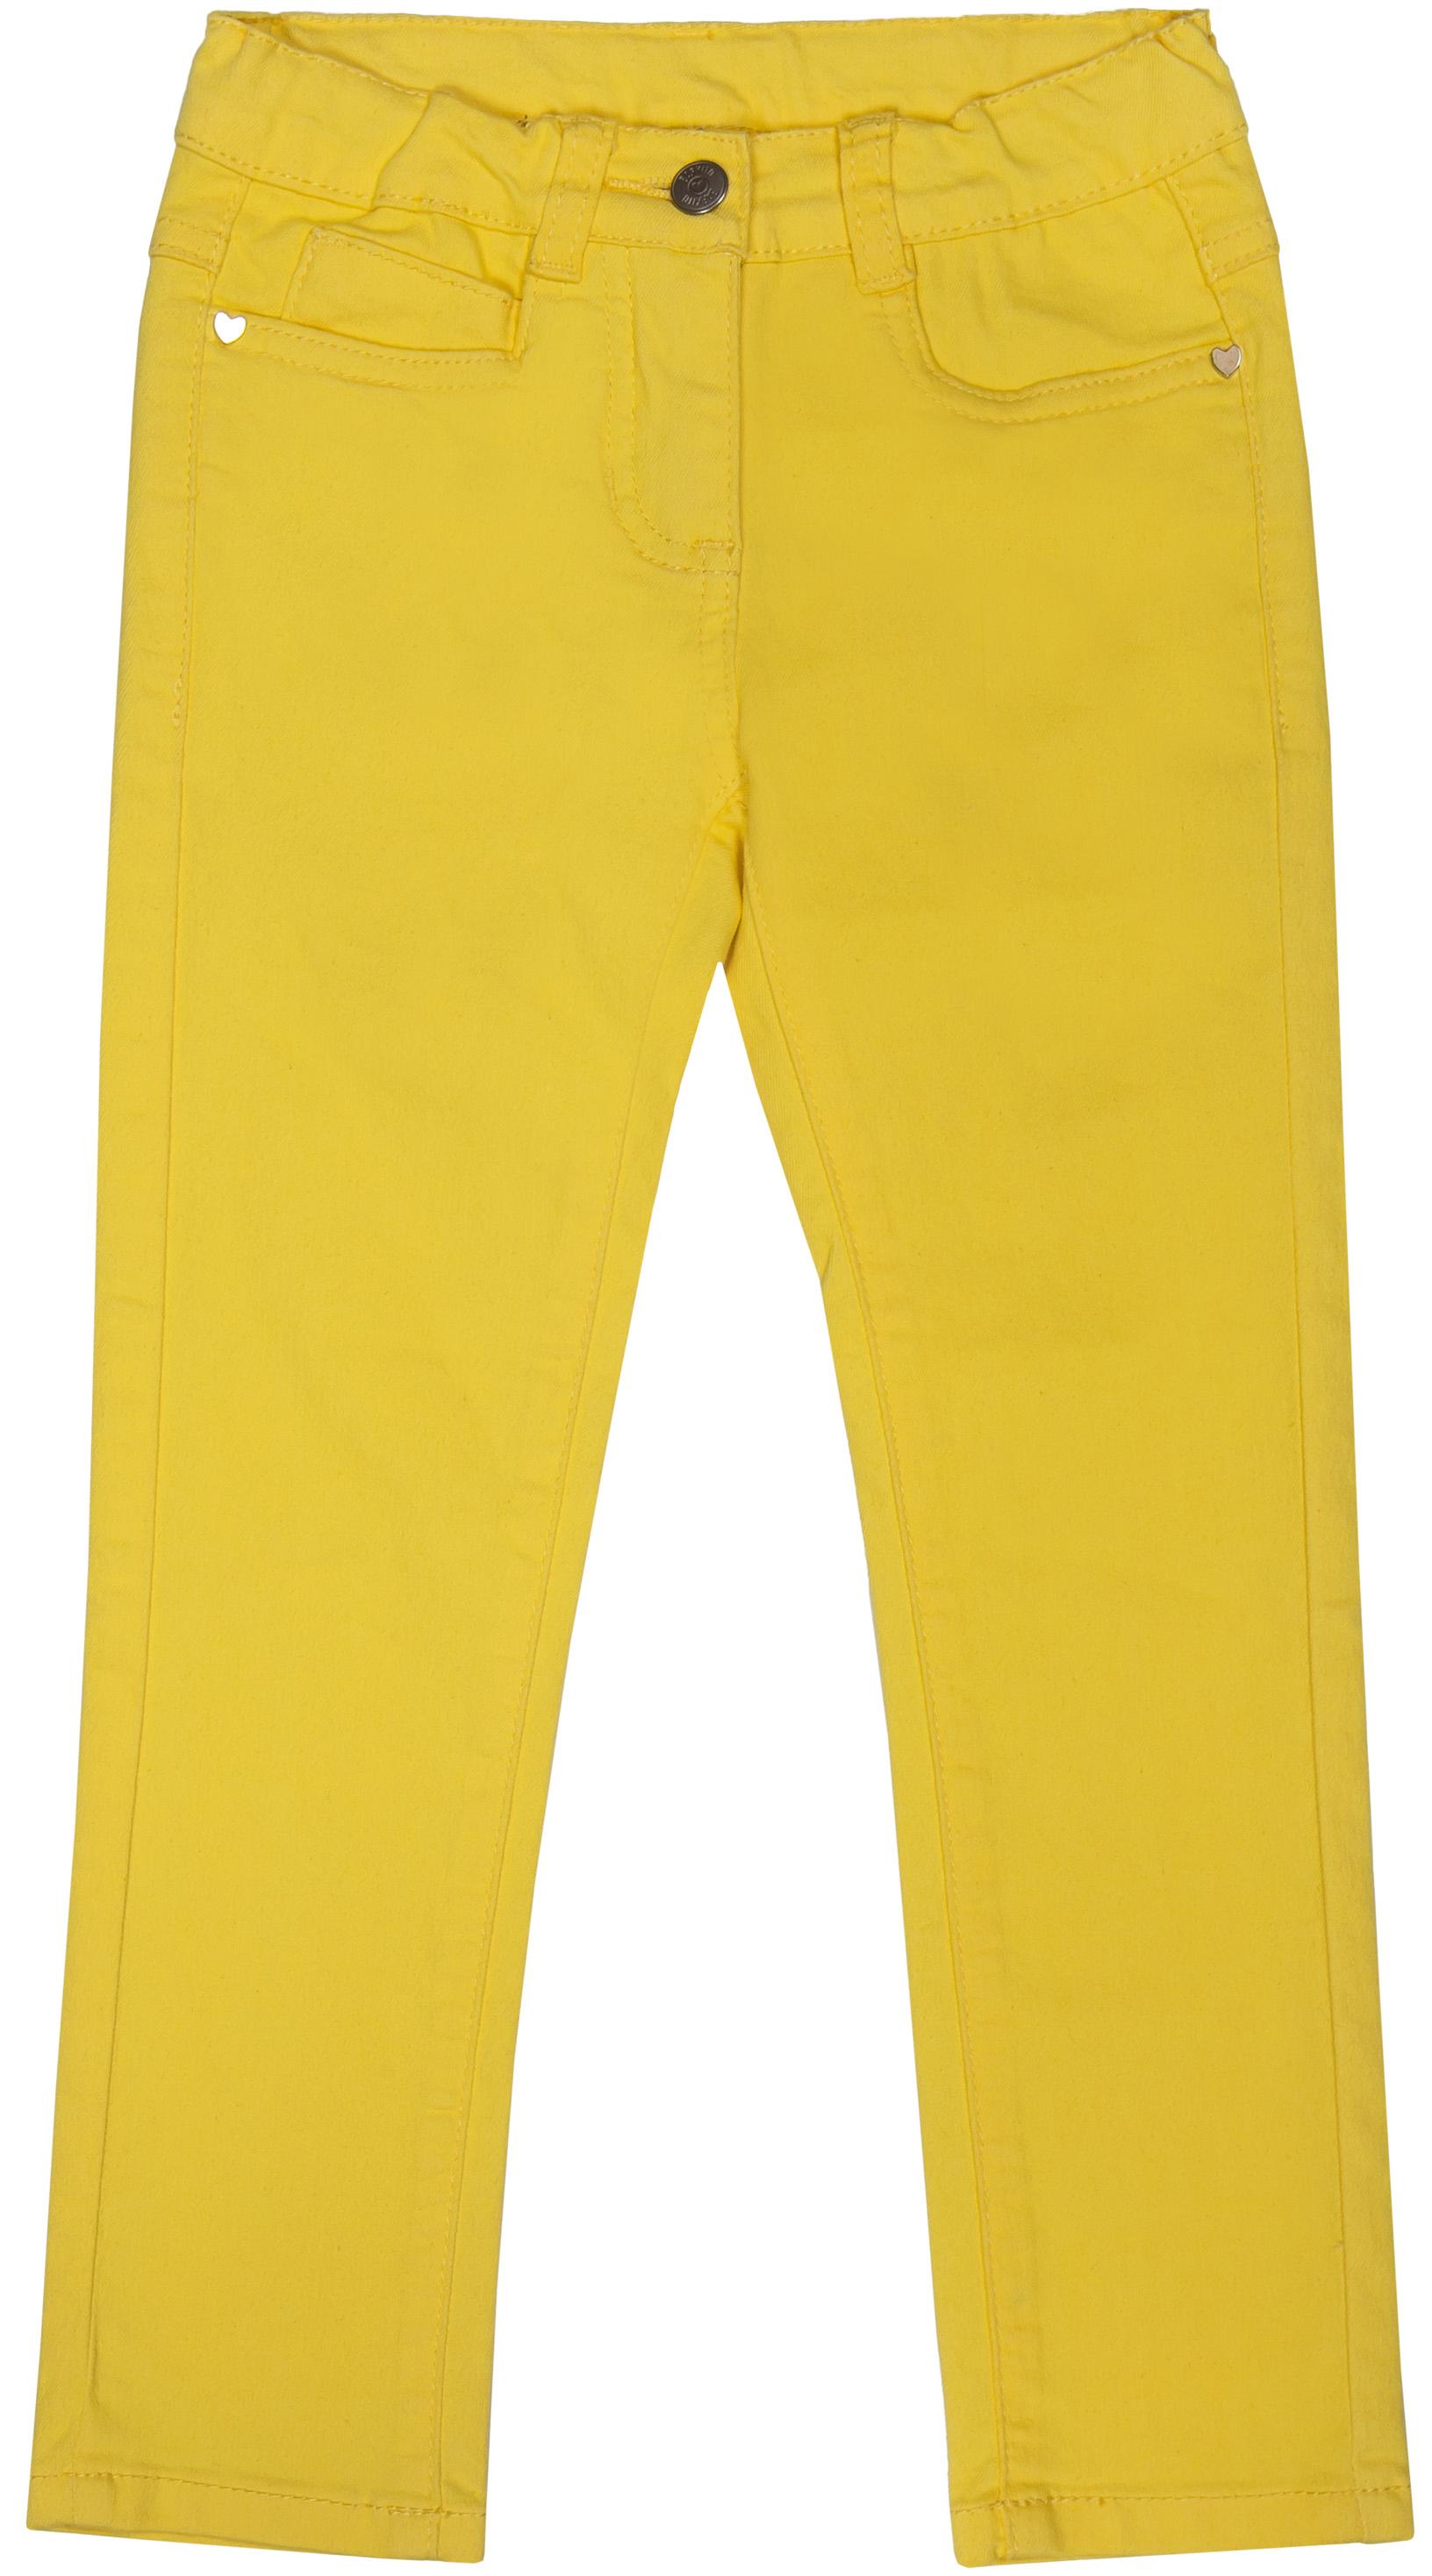 Брюки Barkito Фантазия S18G3007W(2) брюки для девочки barkito фантазия голубые с рисунком